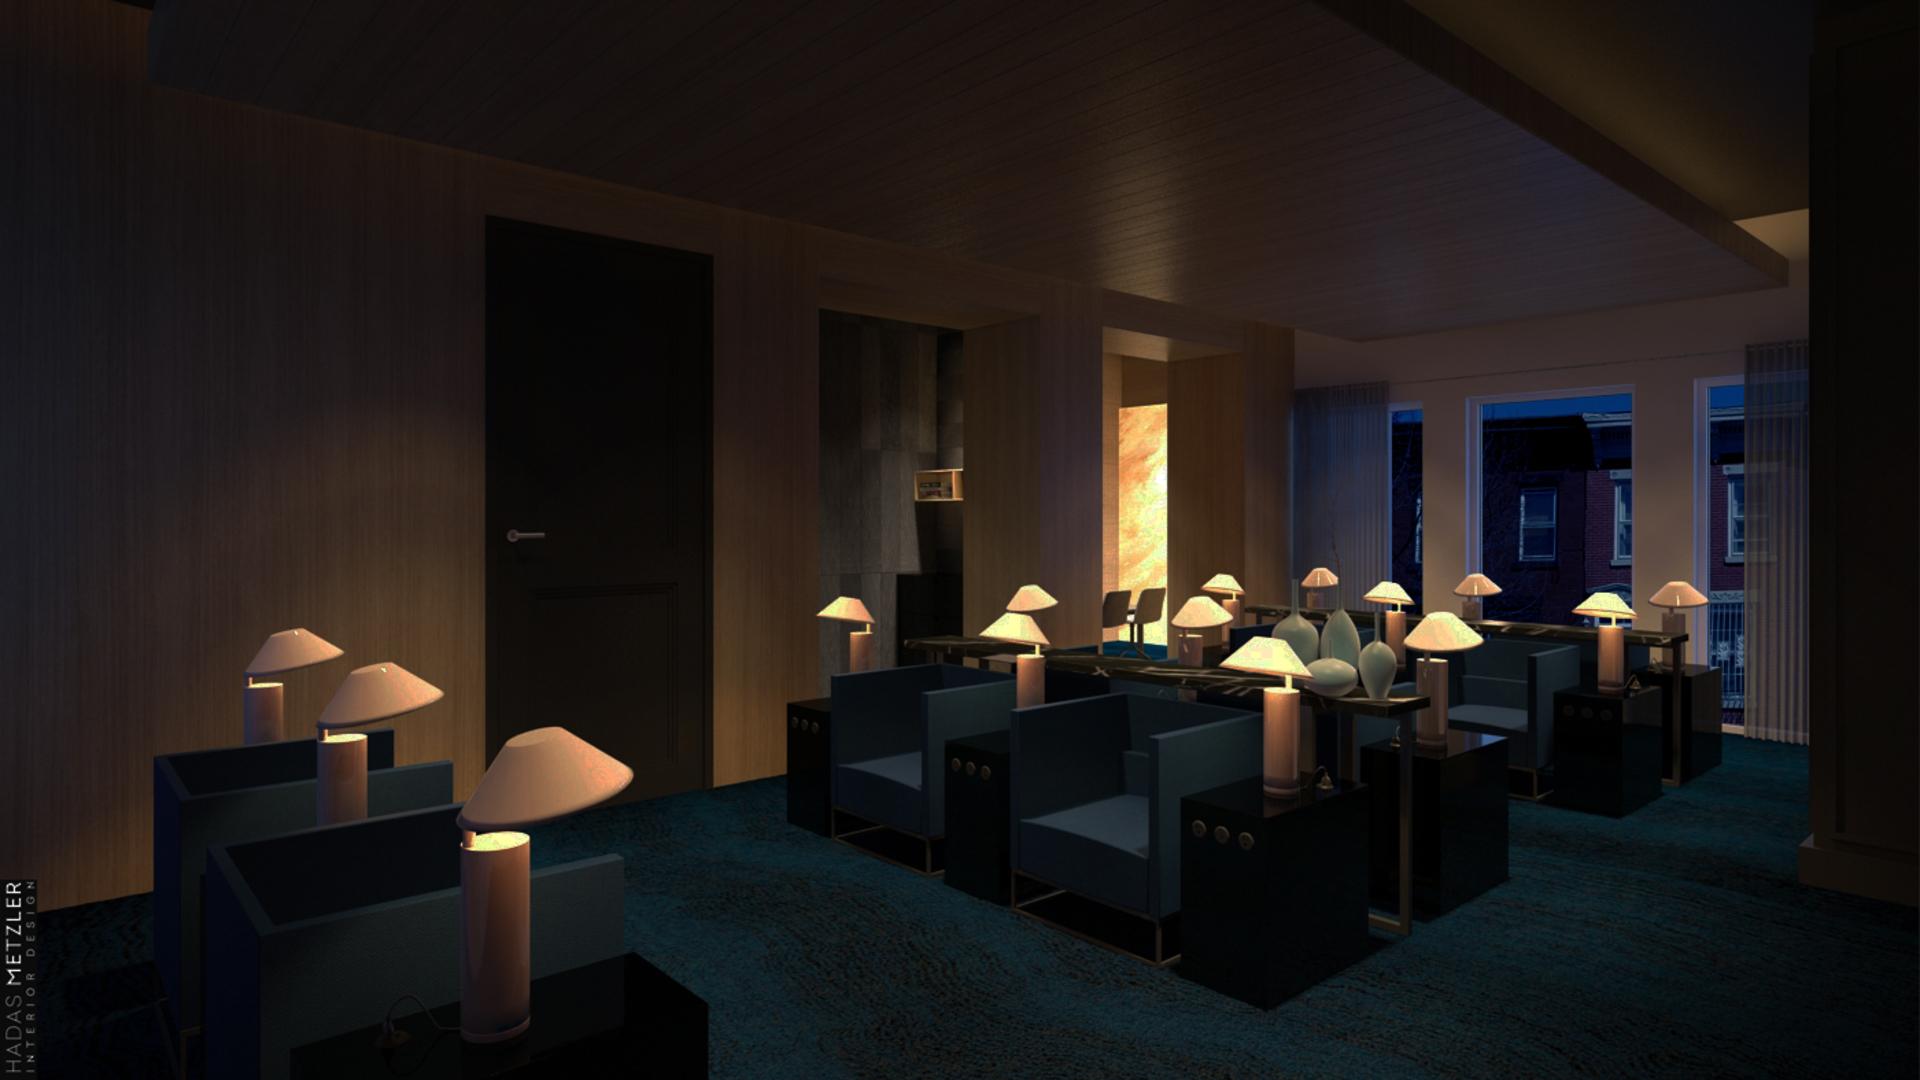 007 321 wythe business lounge 1